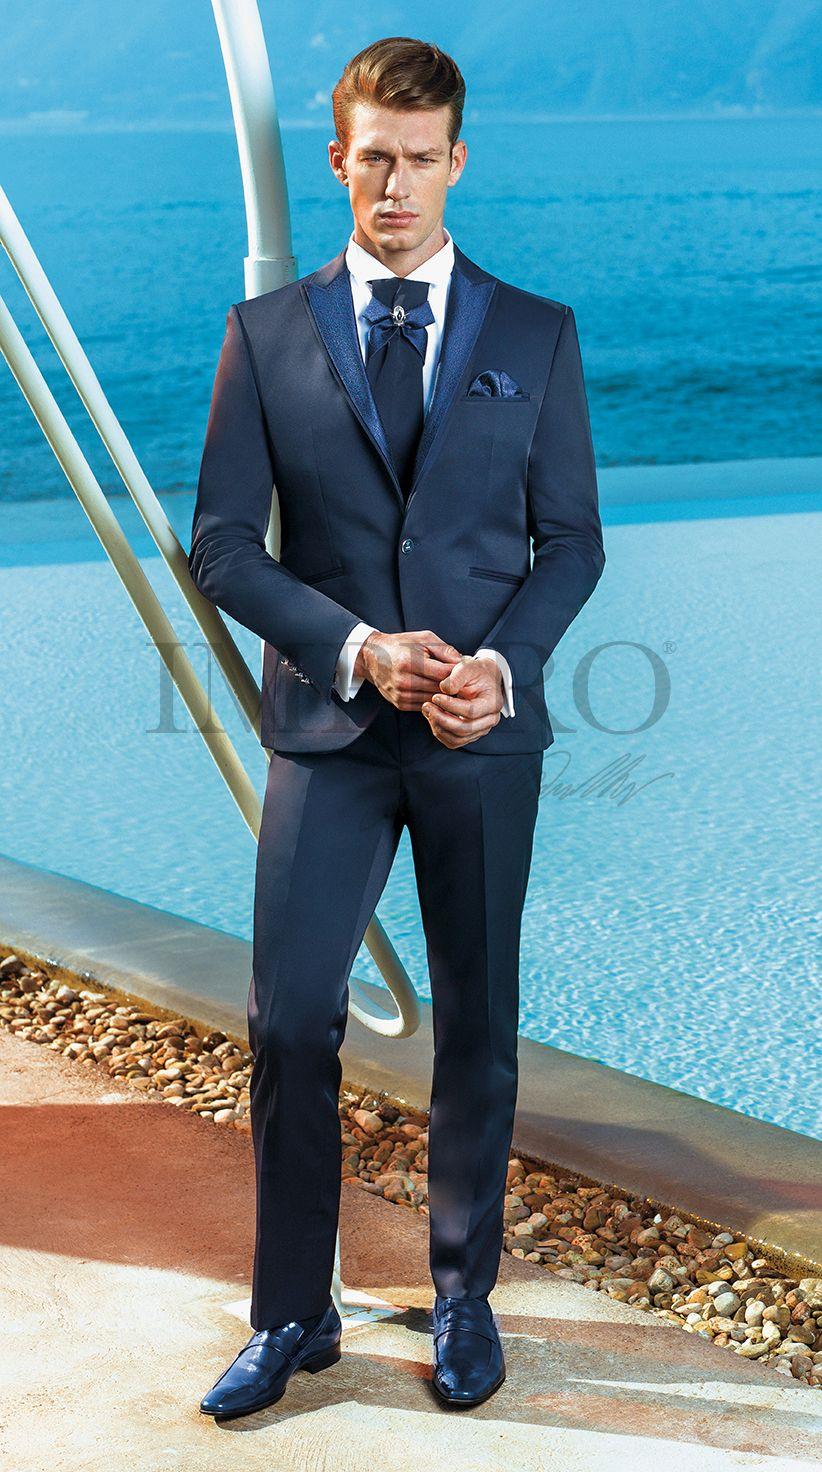 EG 117-17 #sposo #groom #suit #abito #wedding #matrimonio #nozze #blu #blue